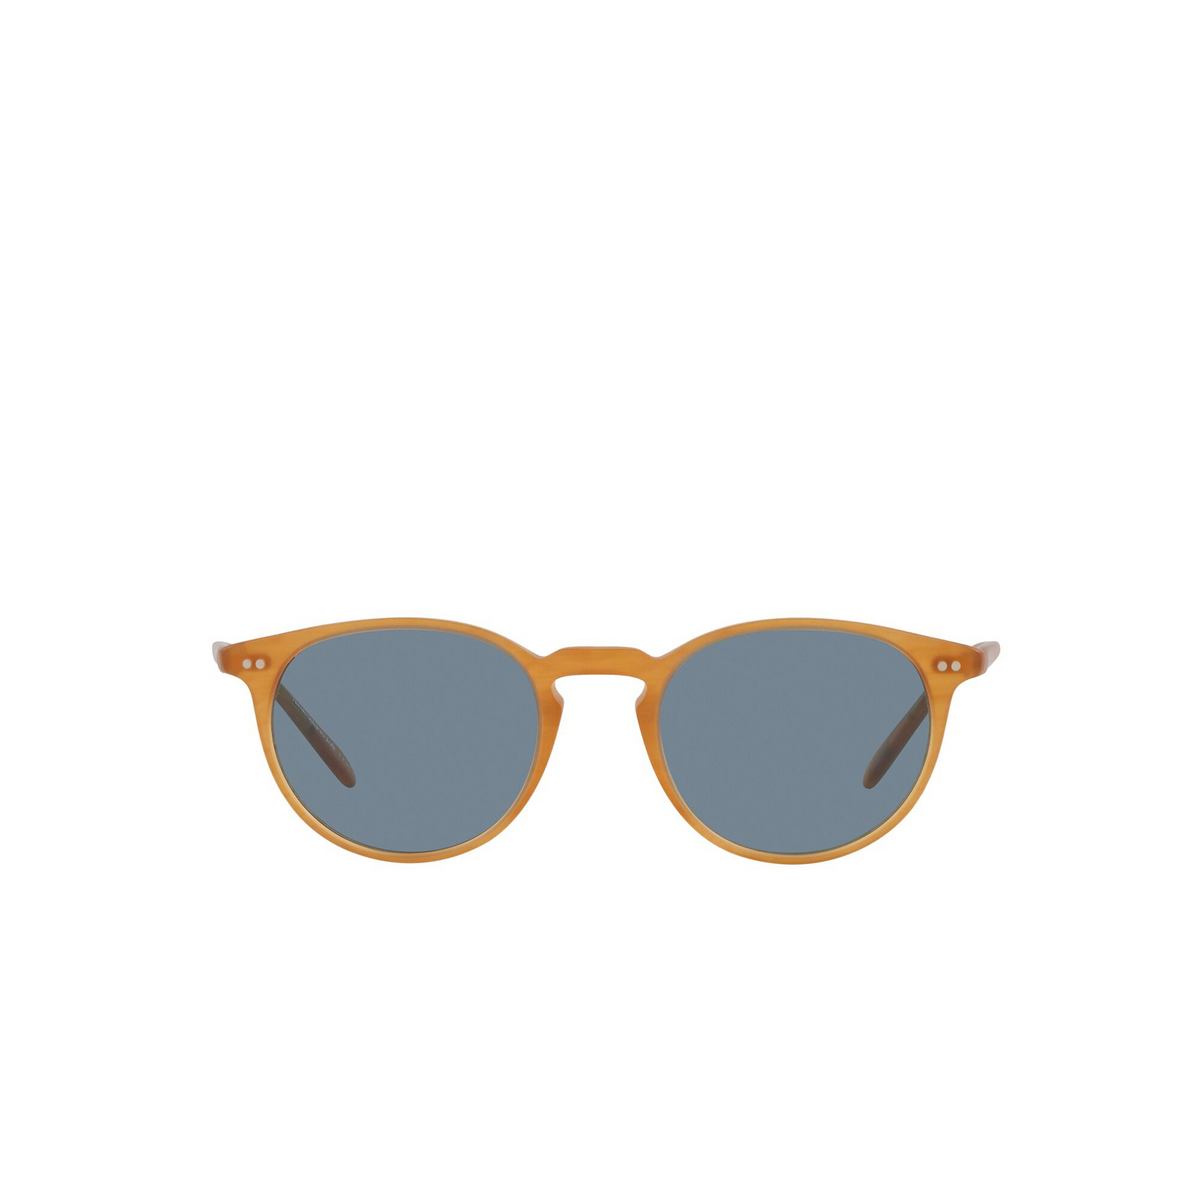 Oliver Peoples® Round Sunglasses: Riley Sun OV5004SU color Semi Matte Amber Tortoise 169956 - front view.